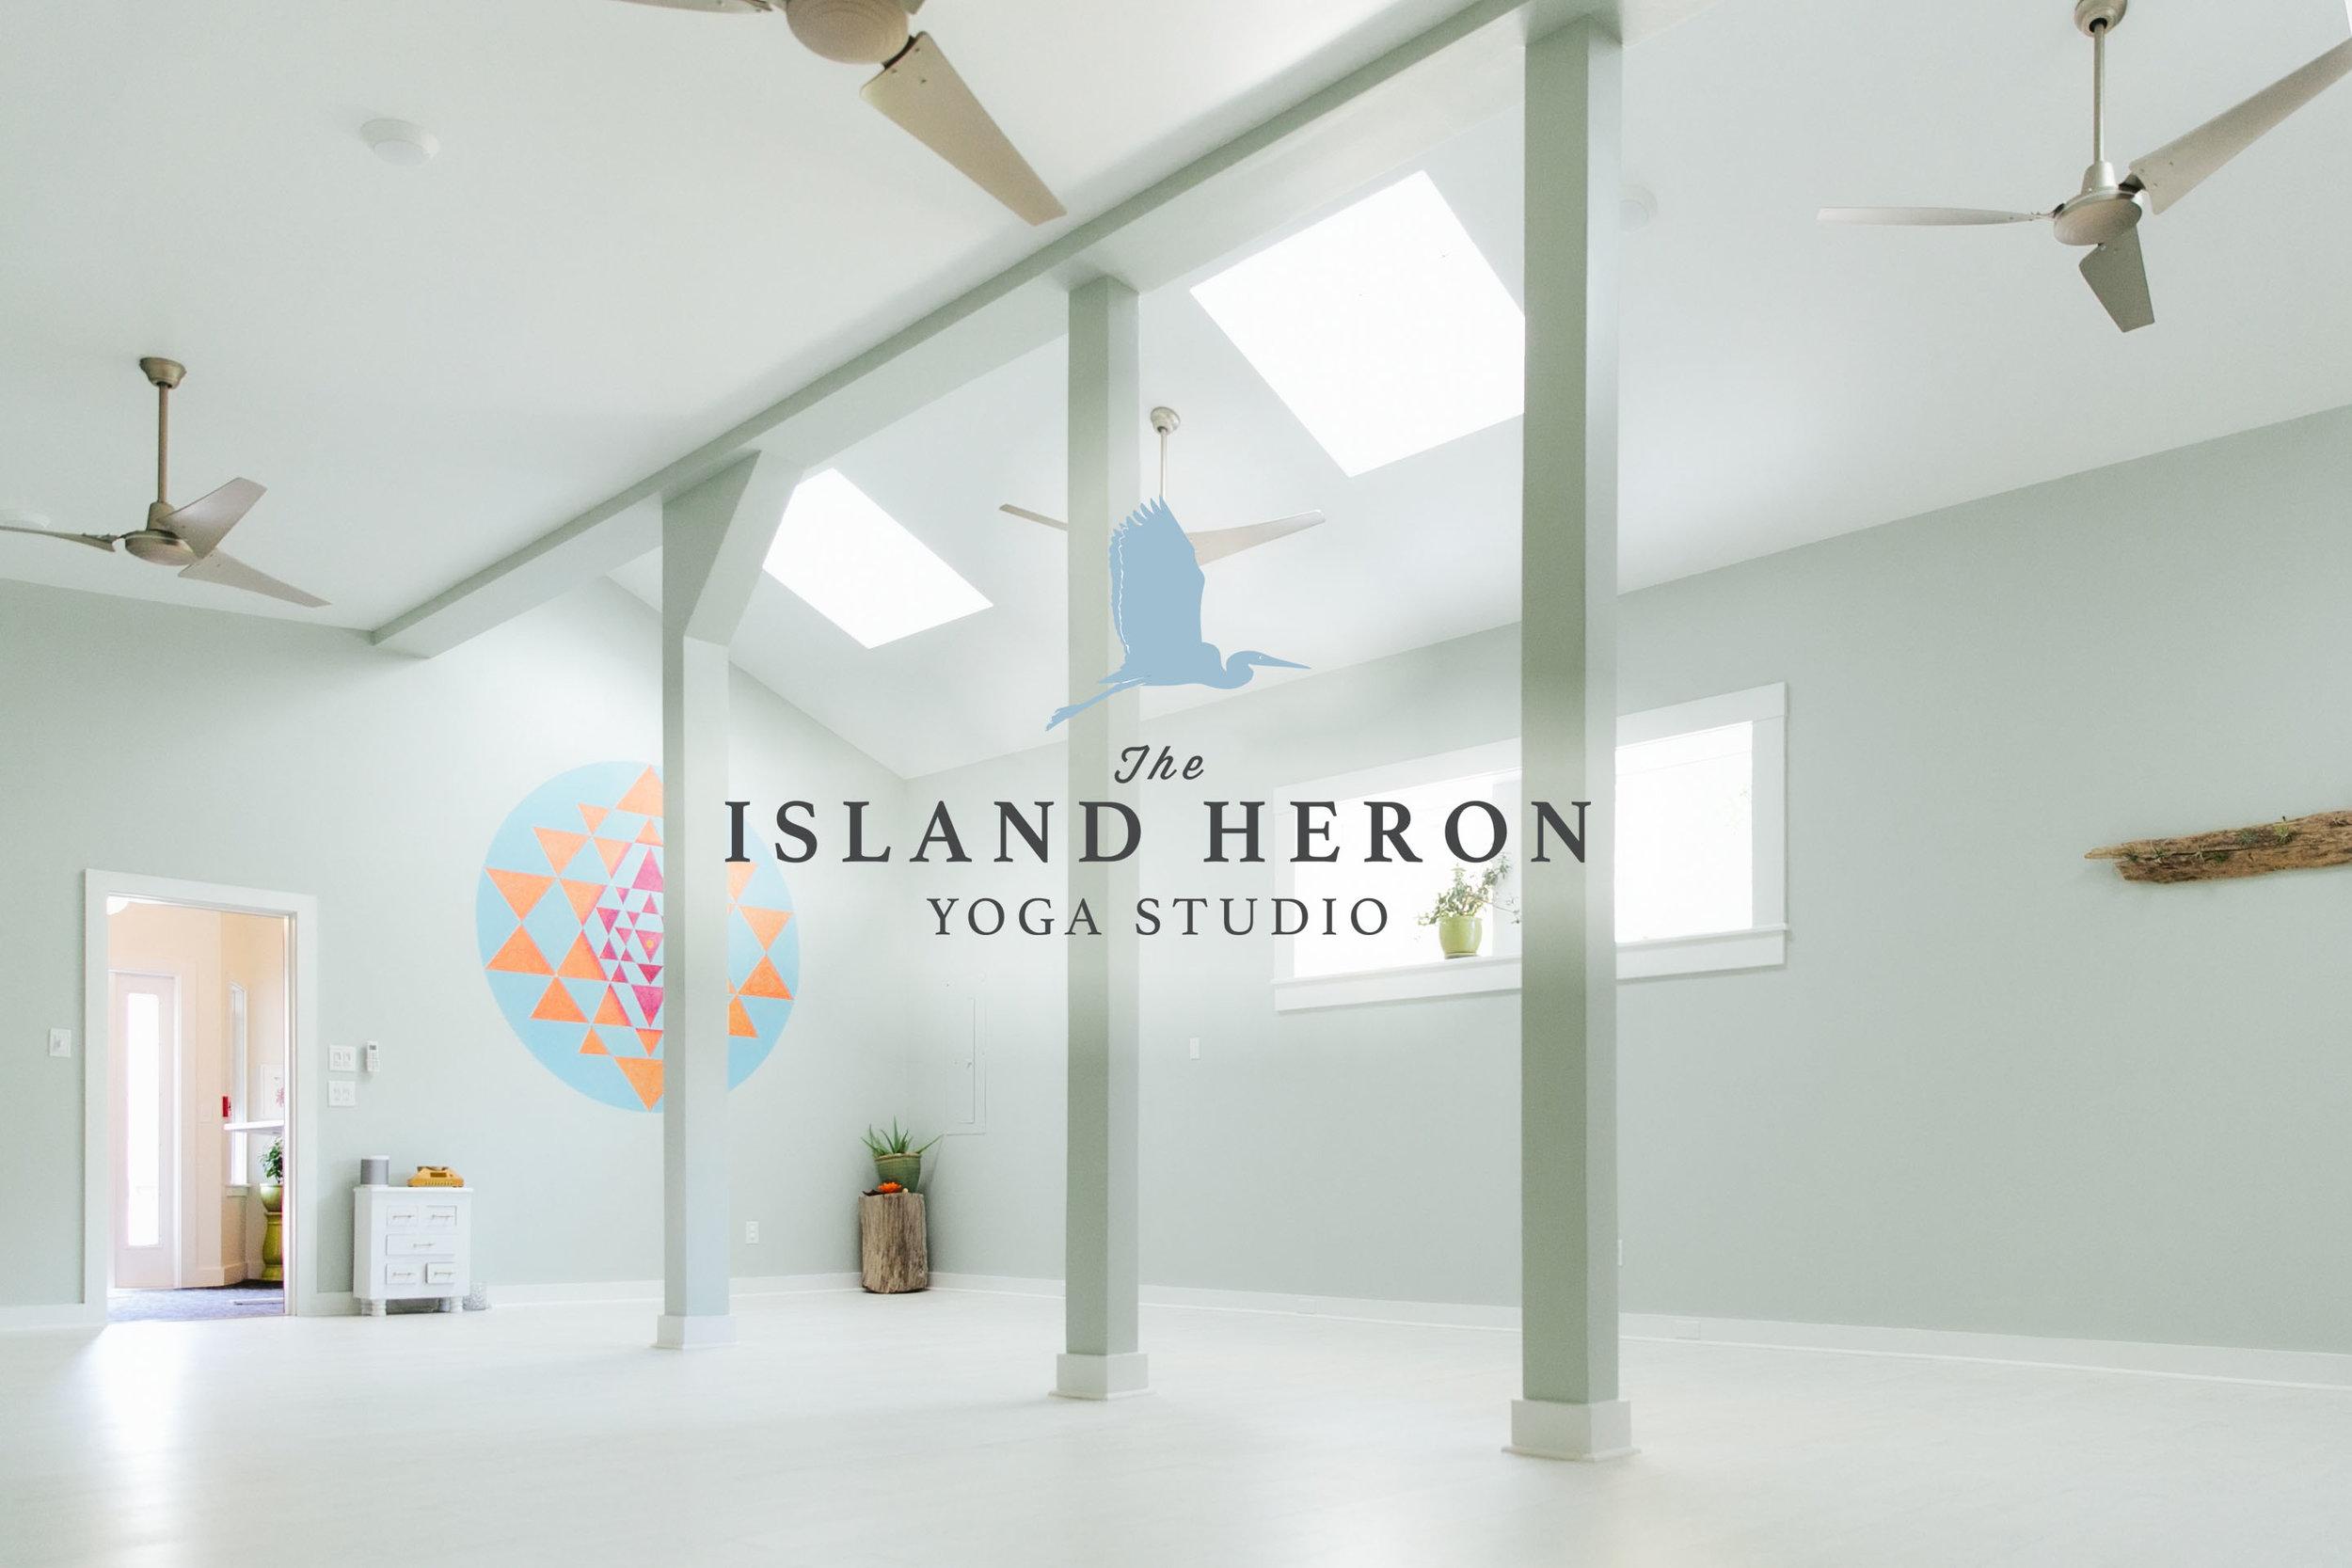 The Island Heron yoga studio, Jamestown, Rhode Island